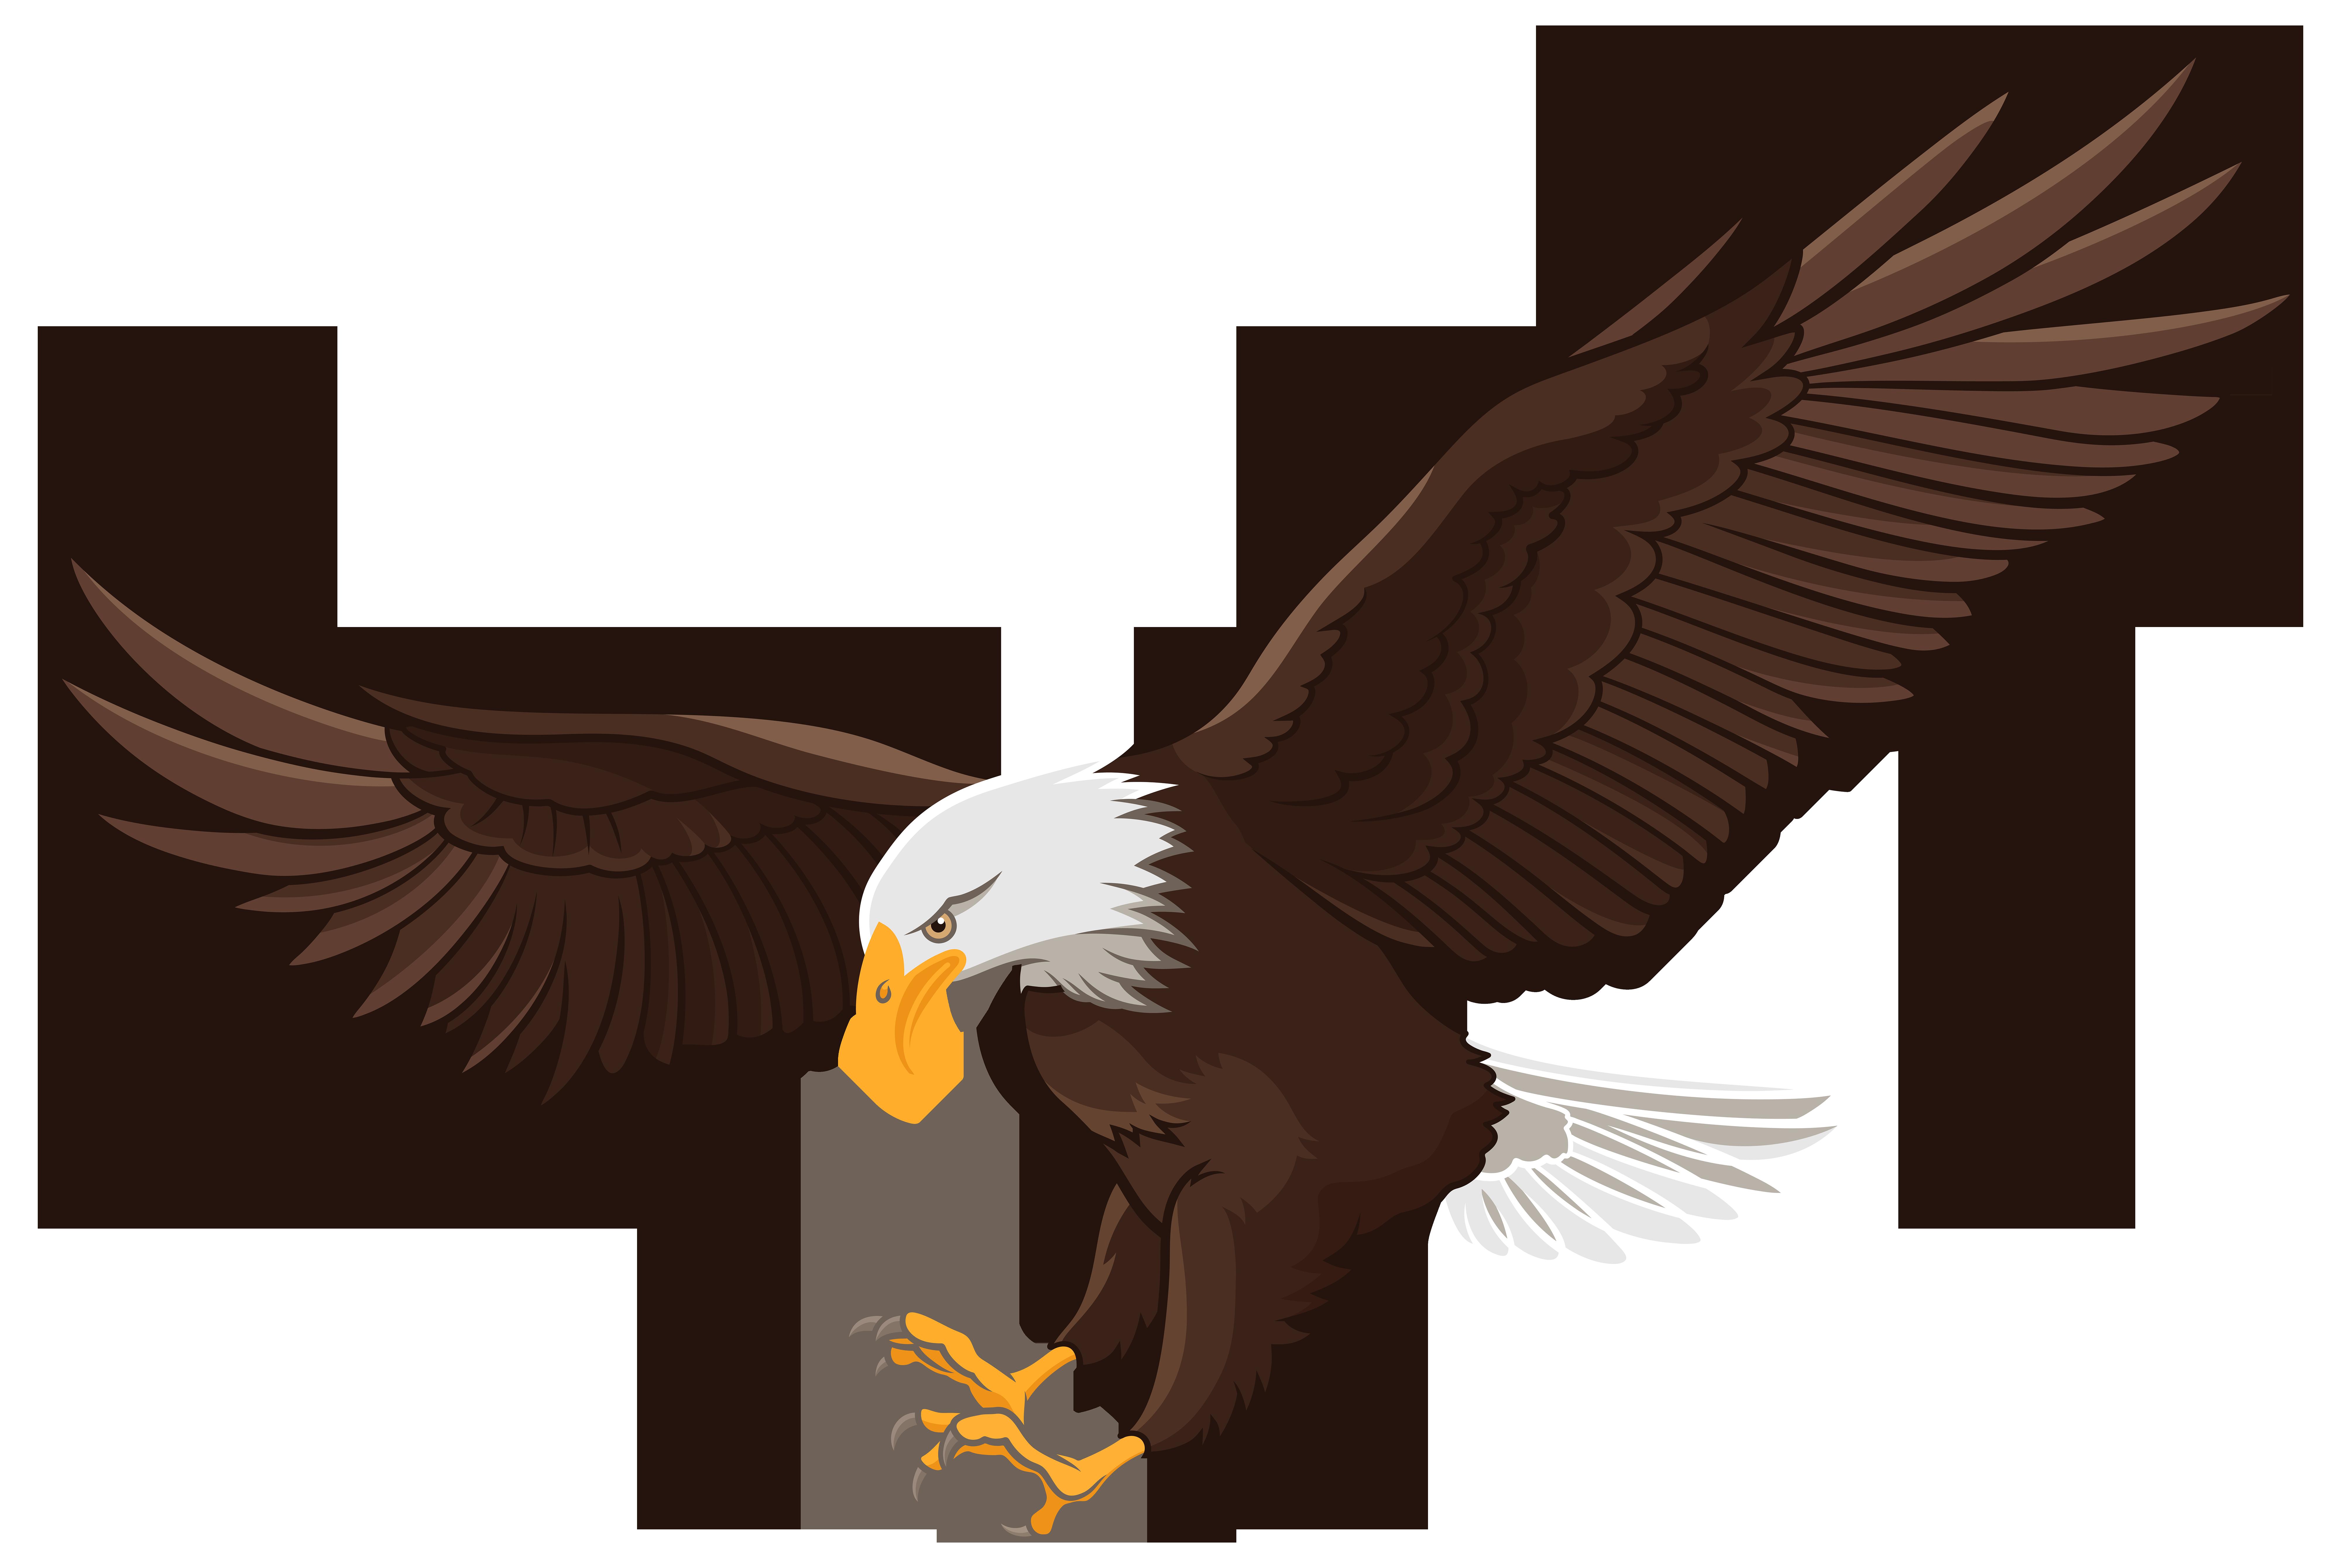 8000x5359 Steller's Sea Eagle Clipart Soaring Eagle